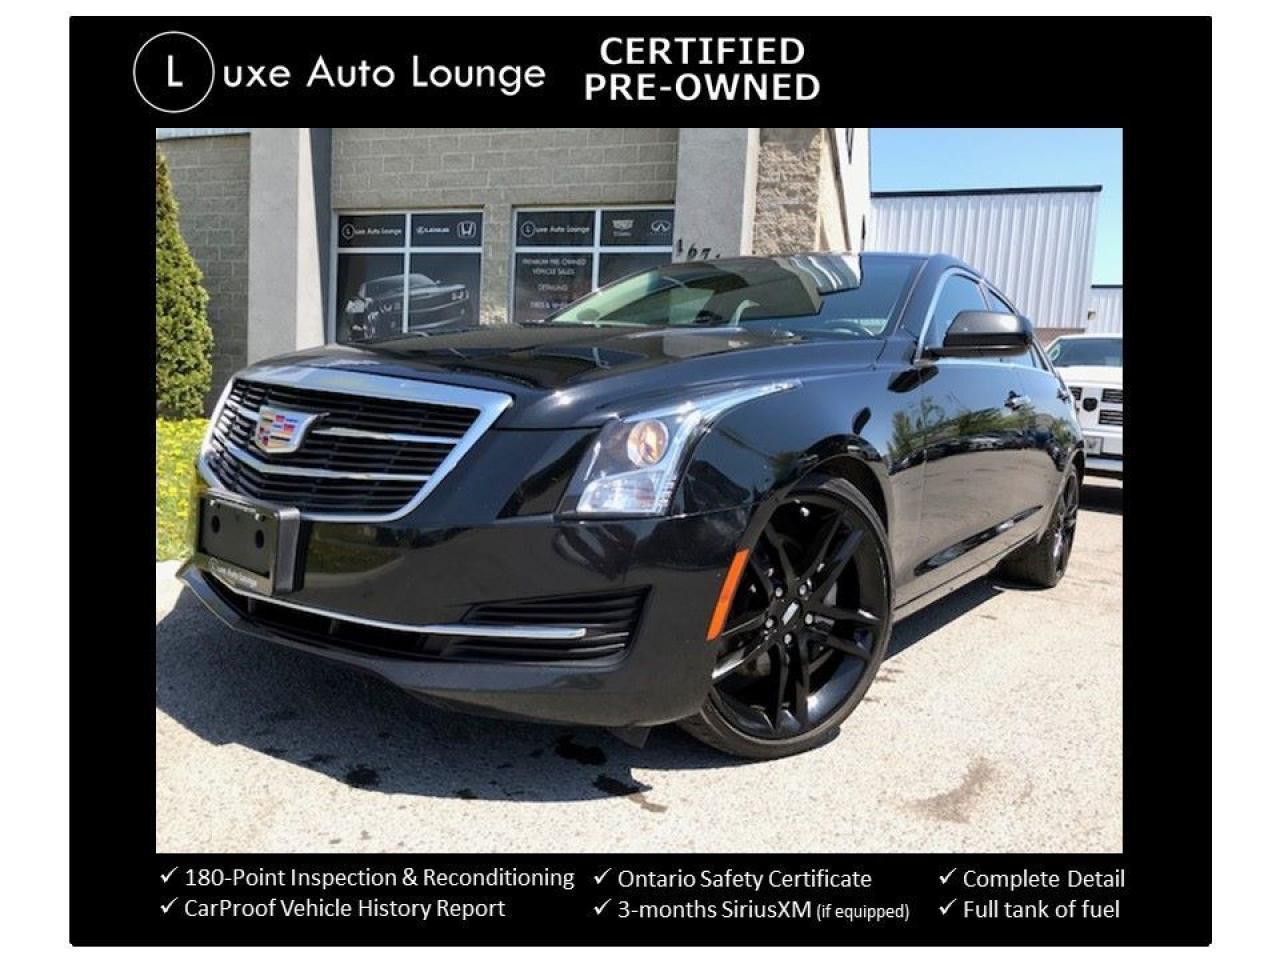 2015 Cadillac ATS TURBO 6SPD! SUNROOF, 19 INCH GLOSS BLACK WHEELS!